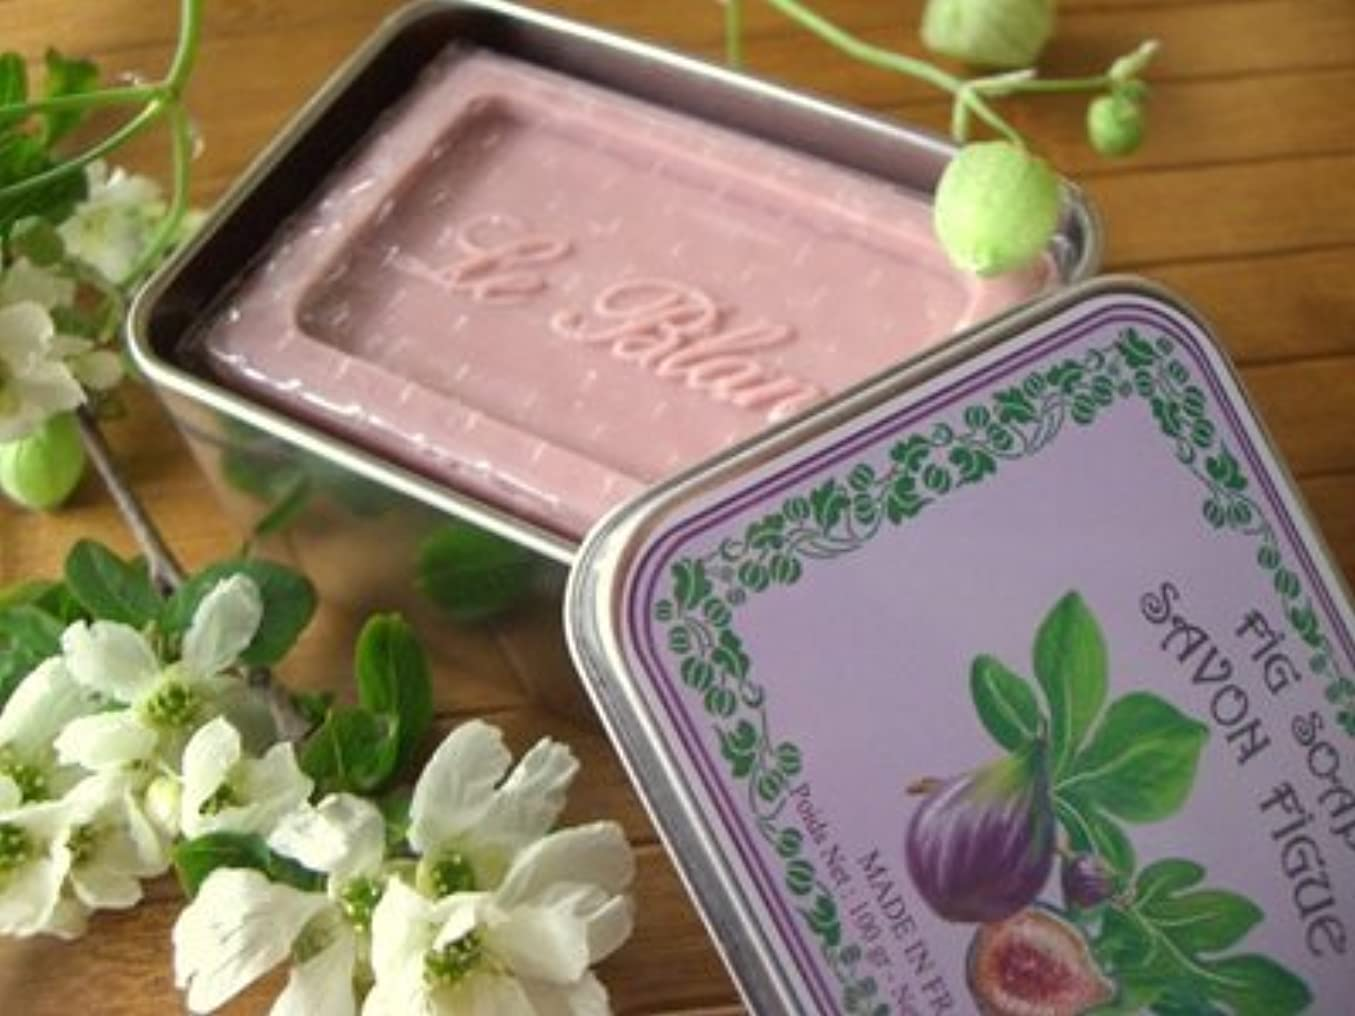 LE BLANC SOAP(ルブランソープ) イチジクの香り LB007ルブランソープ メタルボックス(leblanclb007)